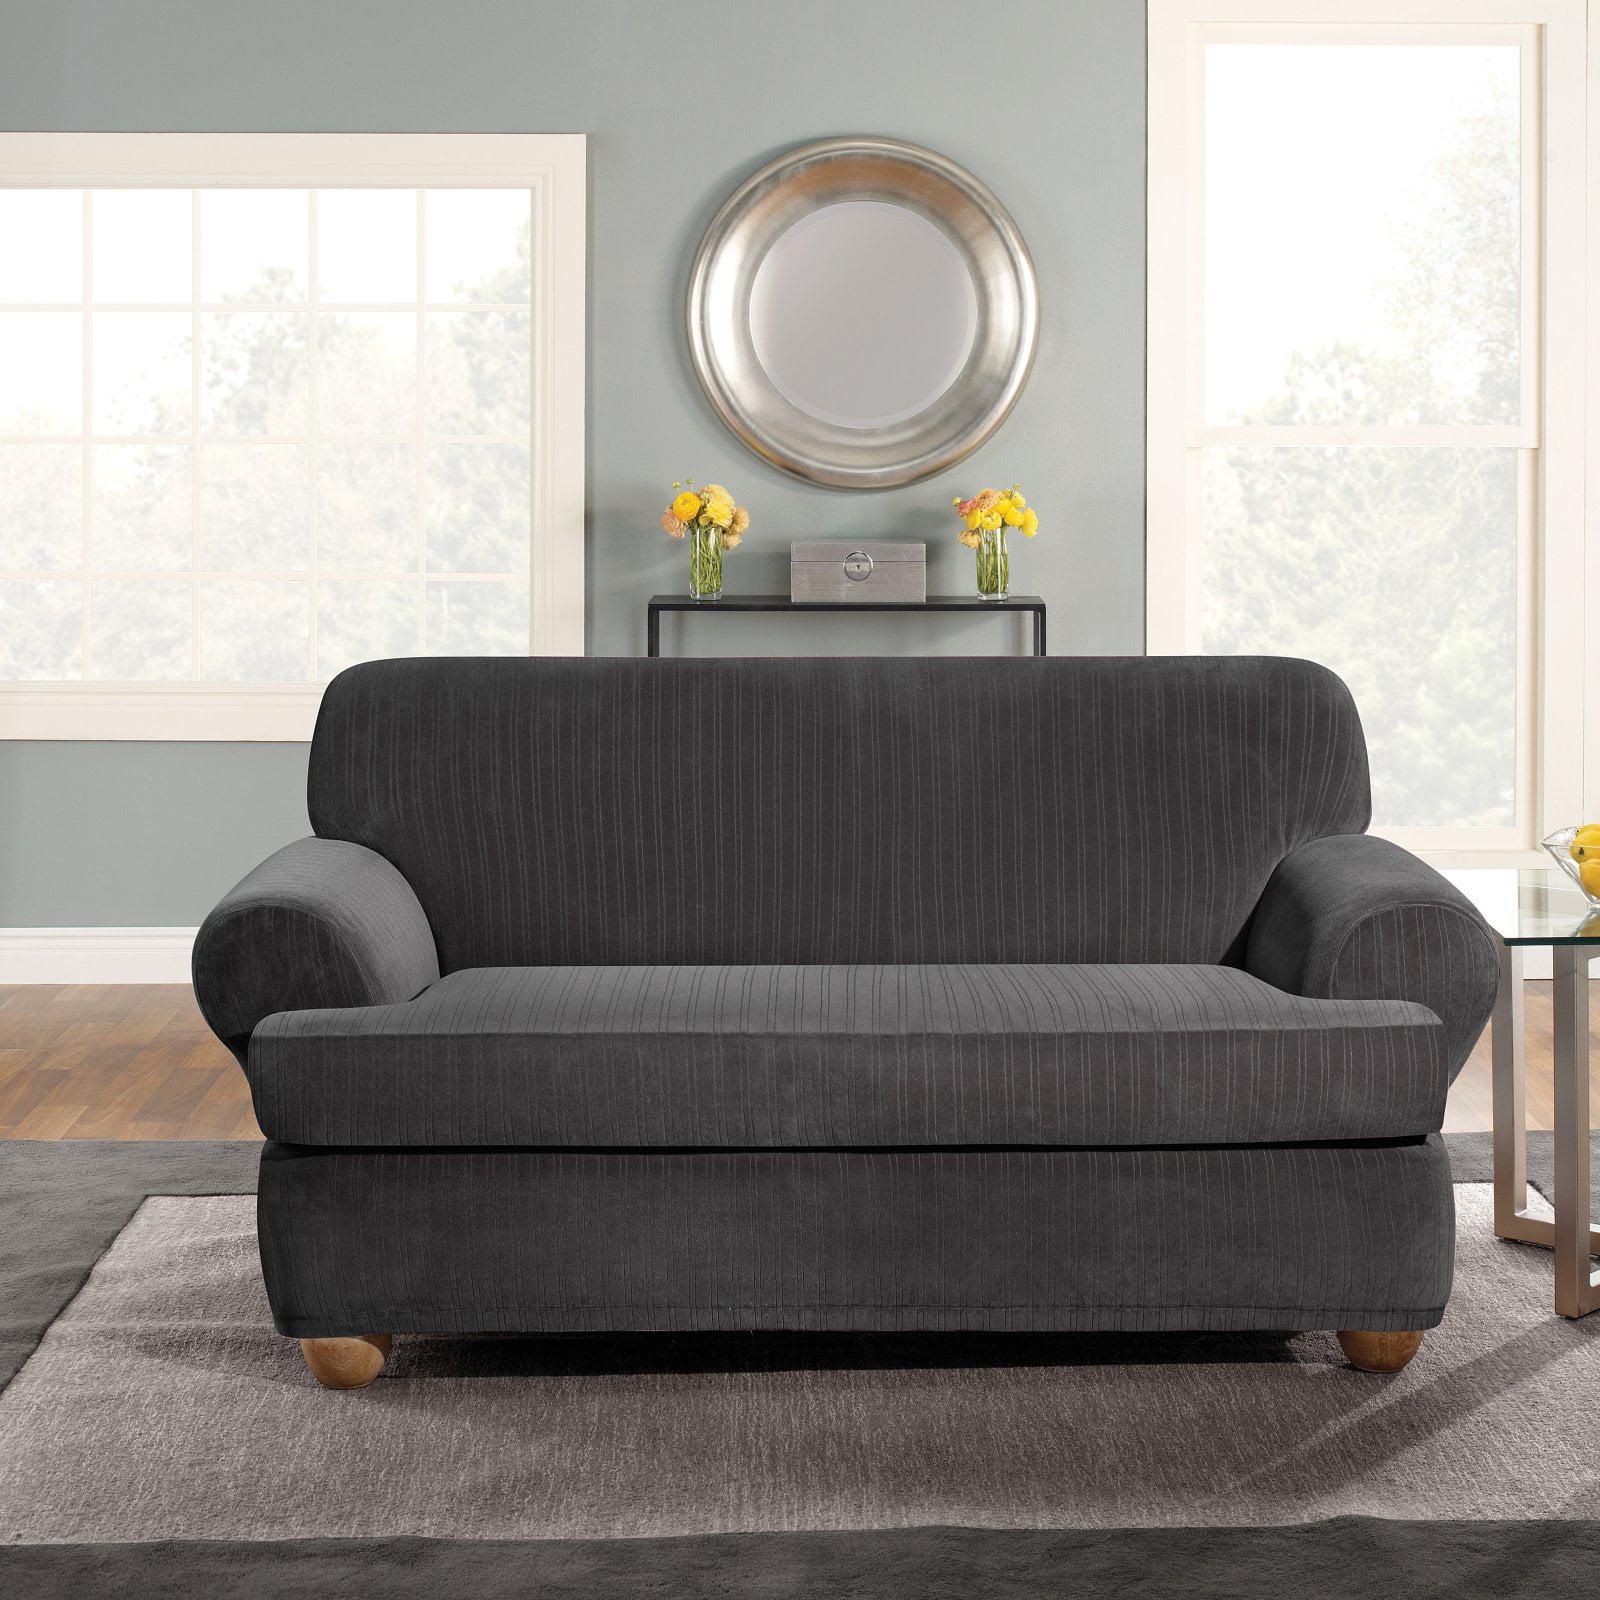 Surefit Stretch Pinstripe 2-Piece T-Cushion Sofa Slipcover, Black -  Walmart